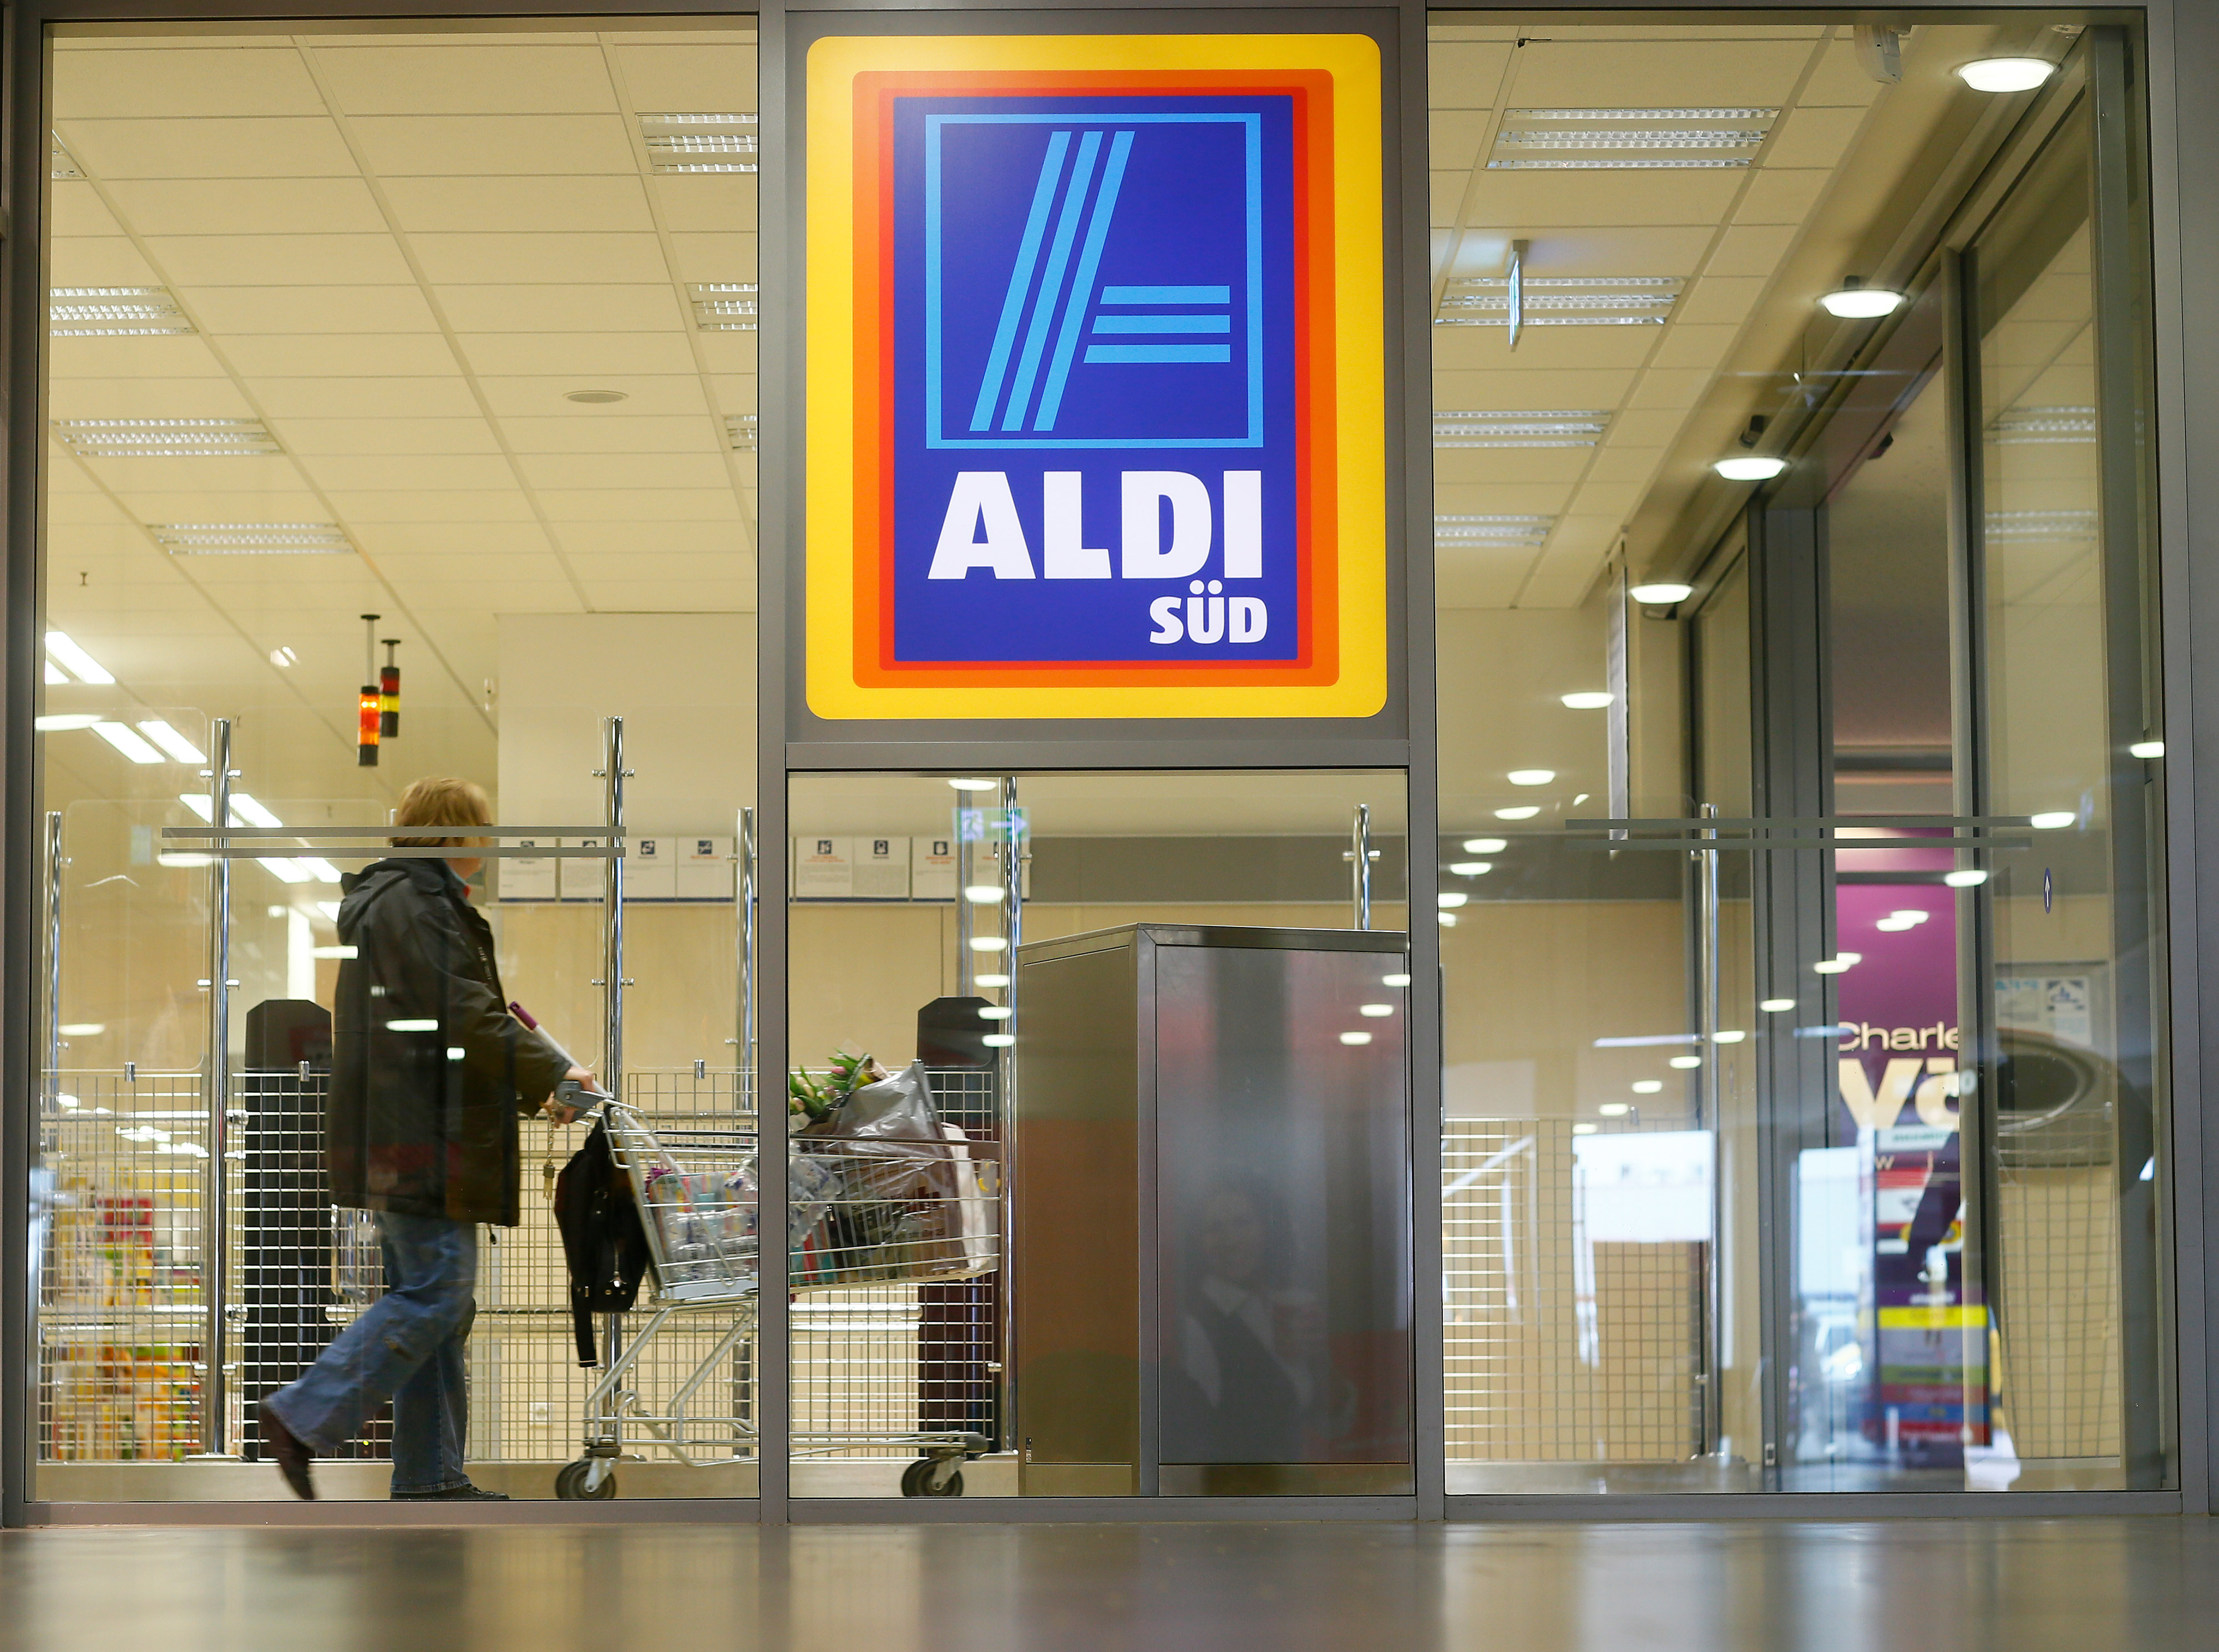 A shopper pushes a shopping cart in an Aldi